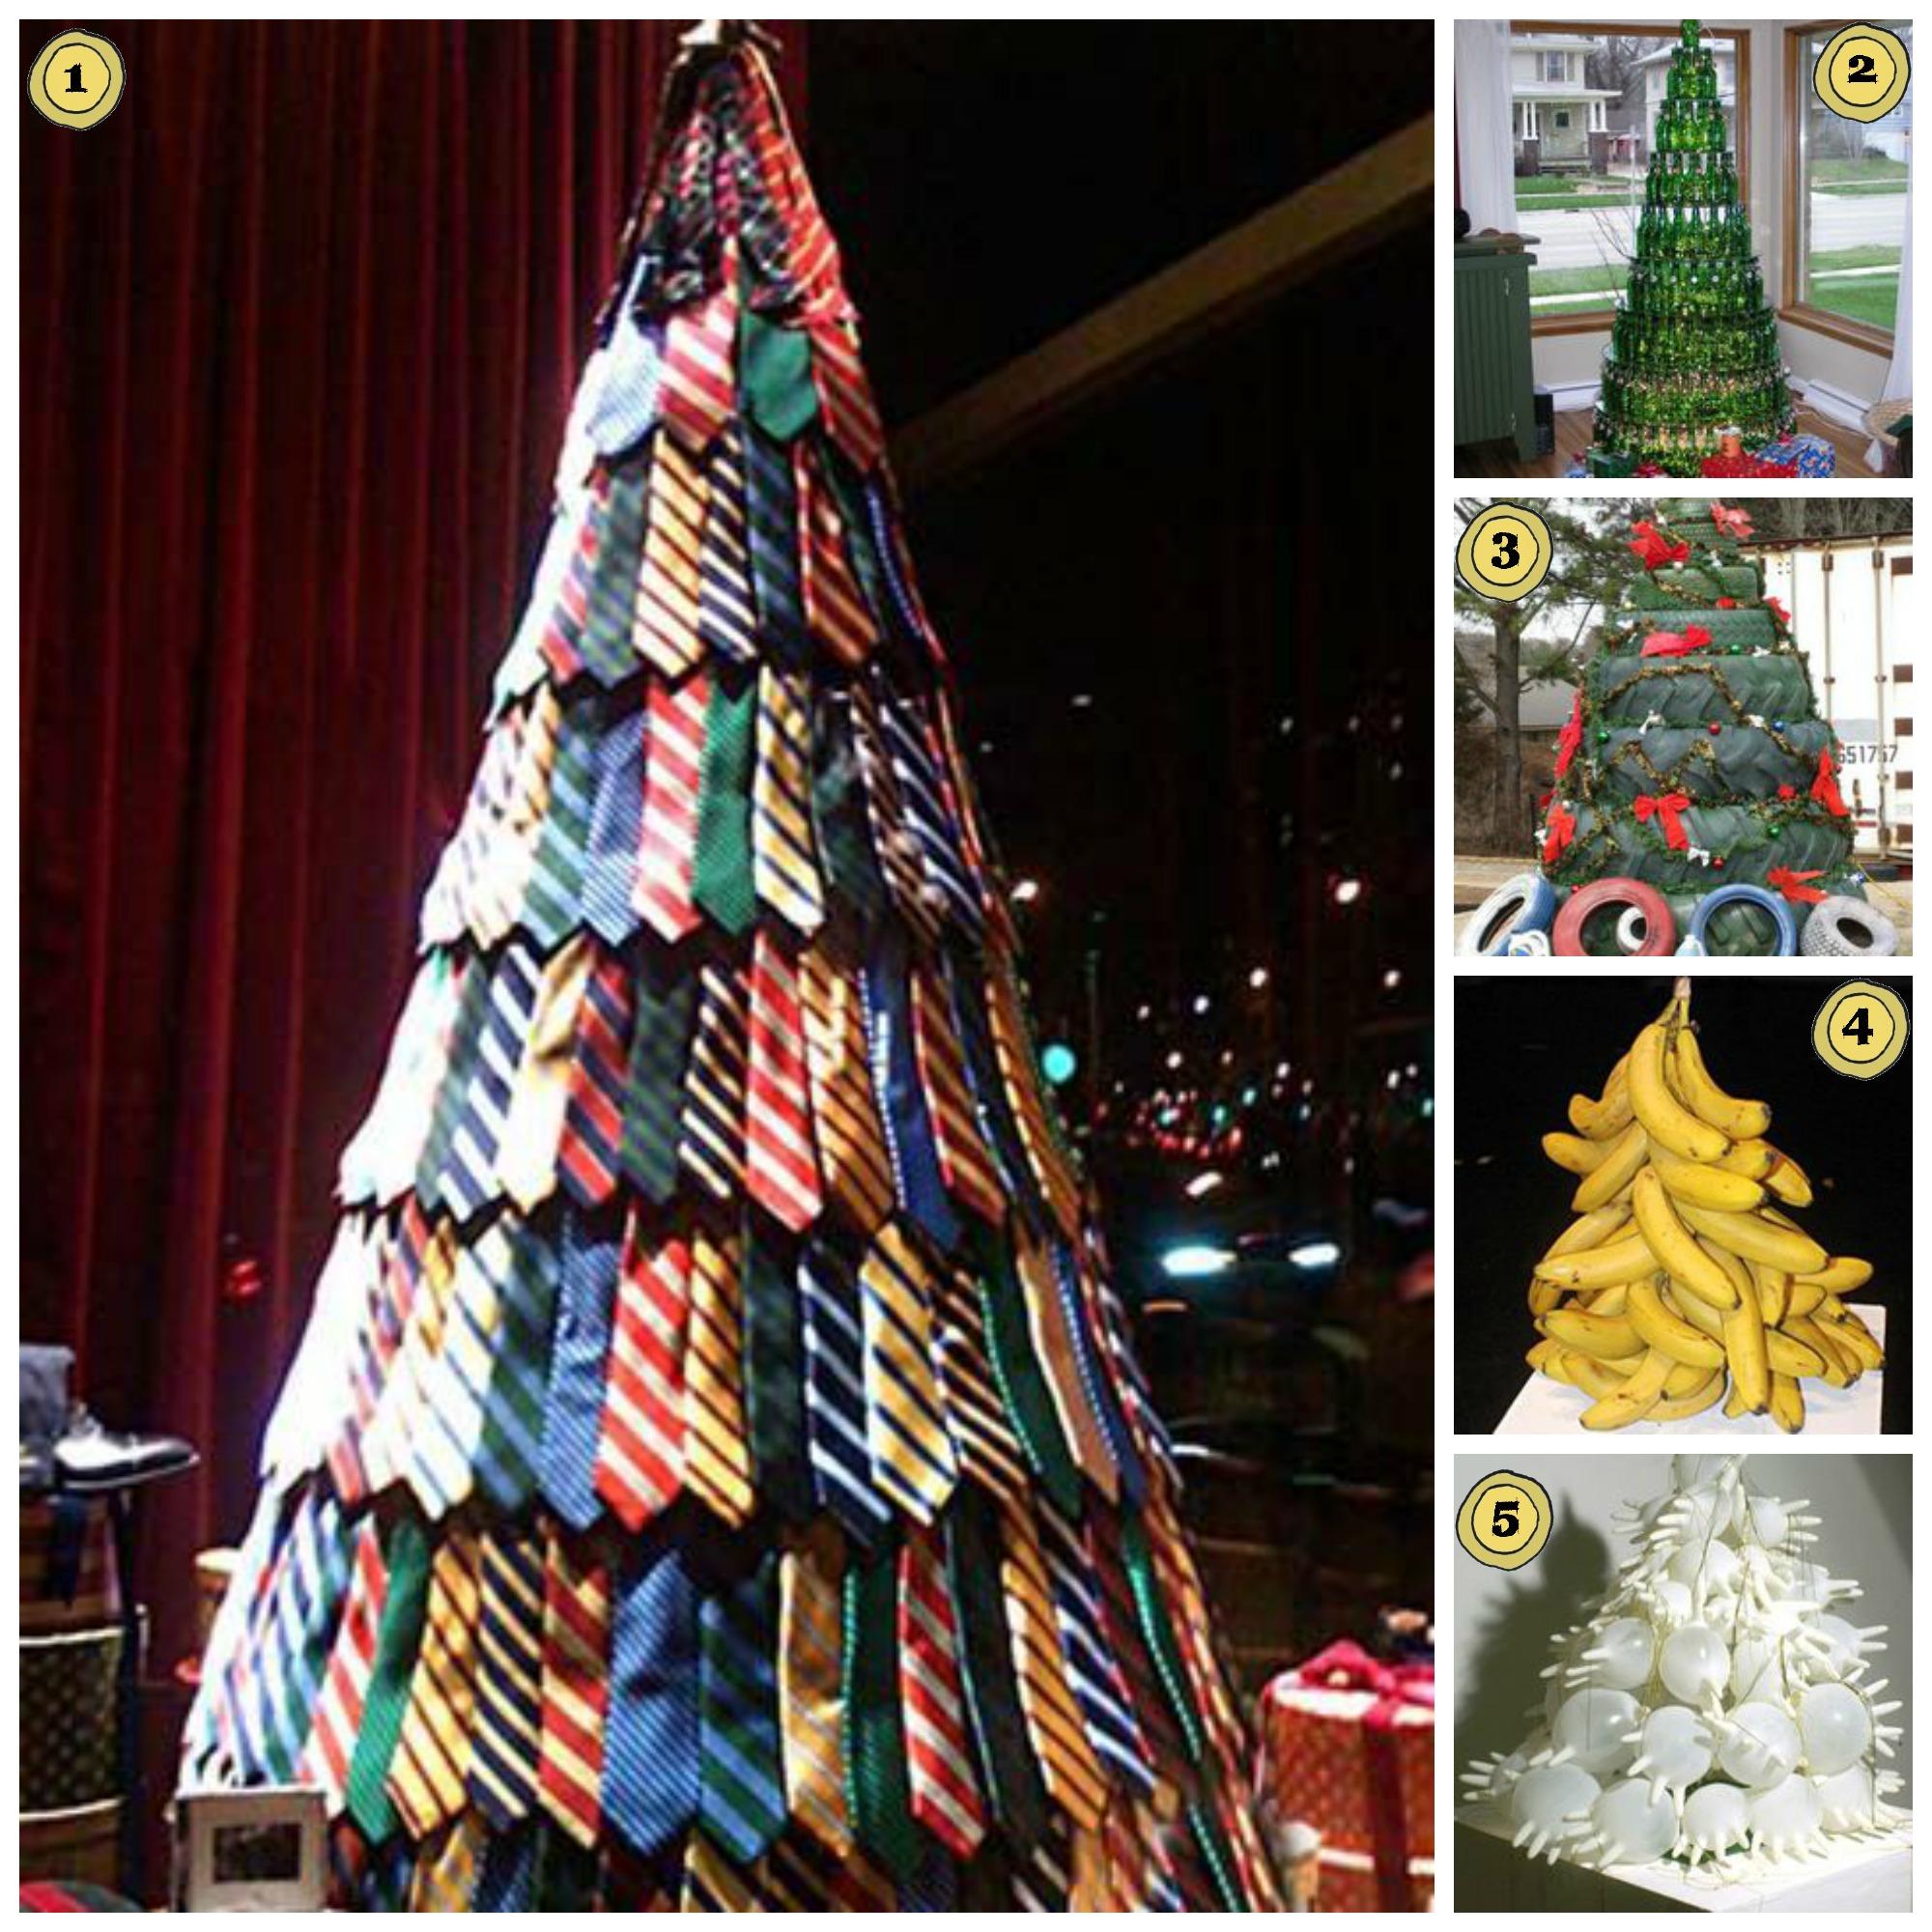 25 Alternative Christmas Trees – My Make Do And Mend Life - Redneck Christmas Tree Decorations